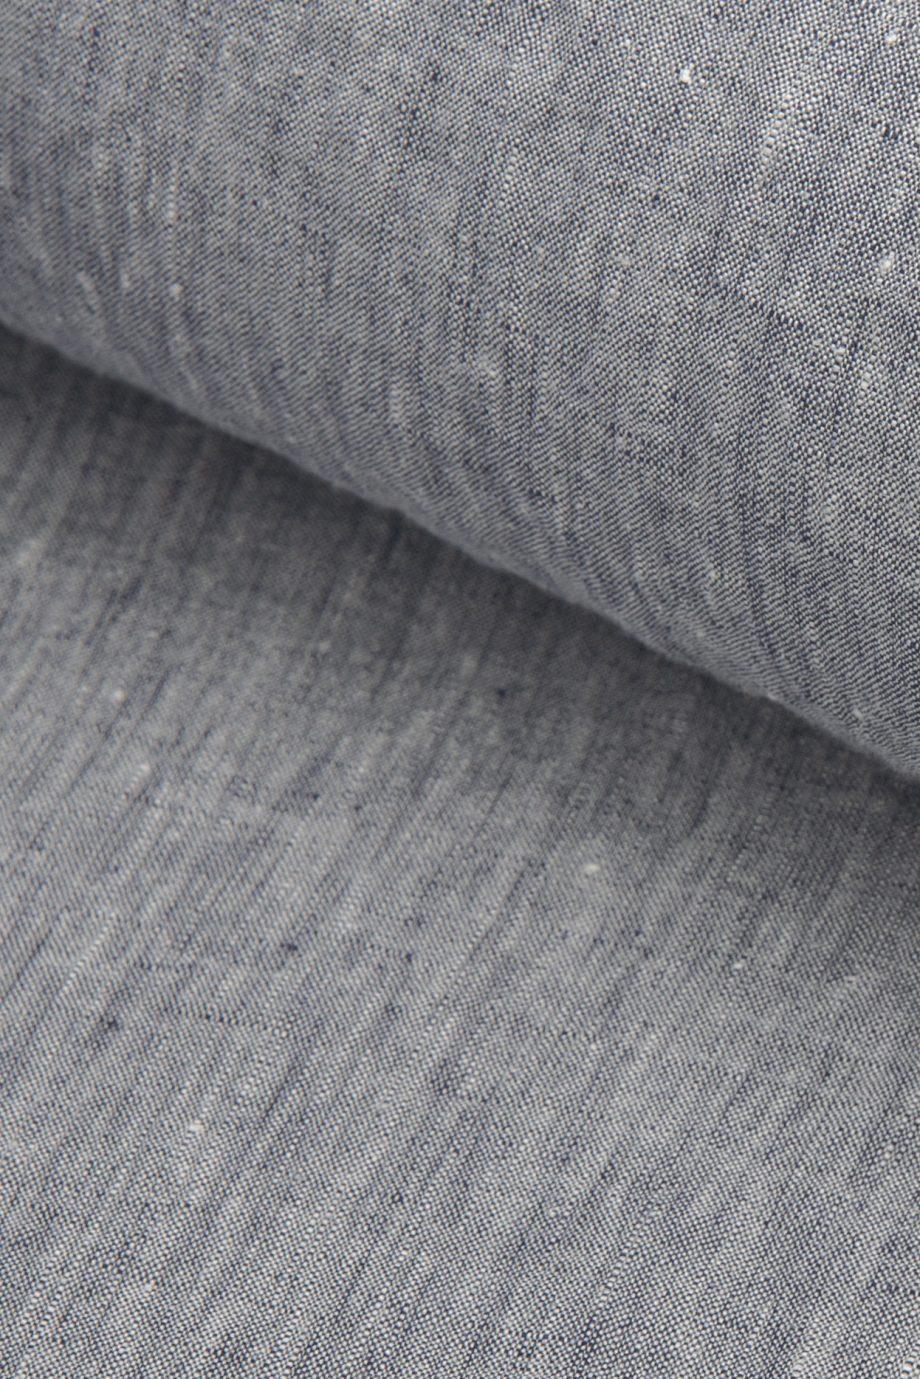 Grey eco-certified plain weave 100% linen hand cut